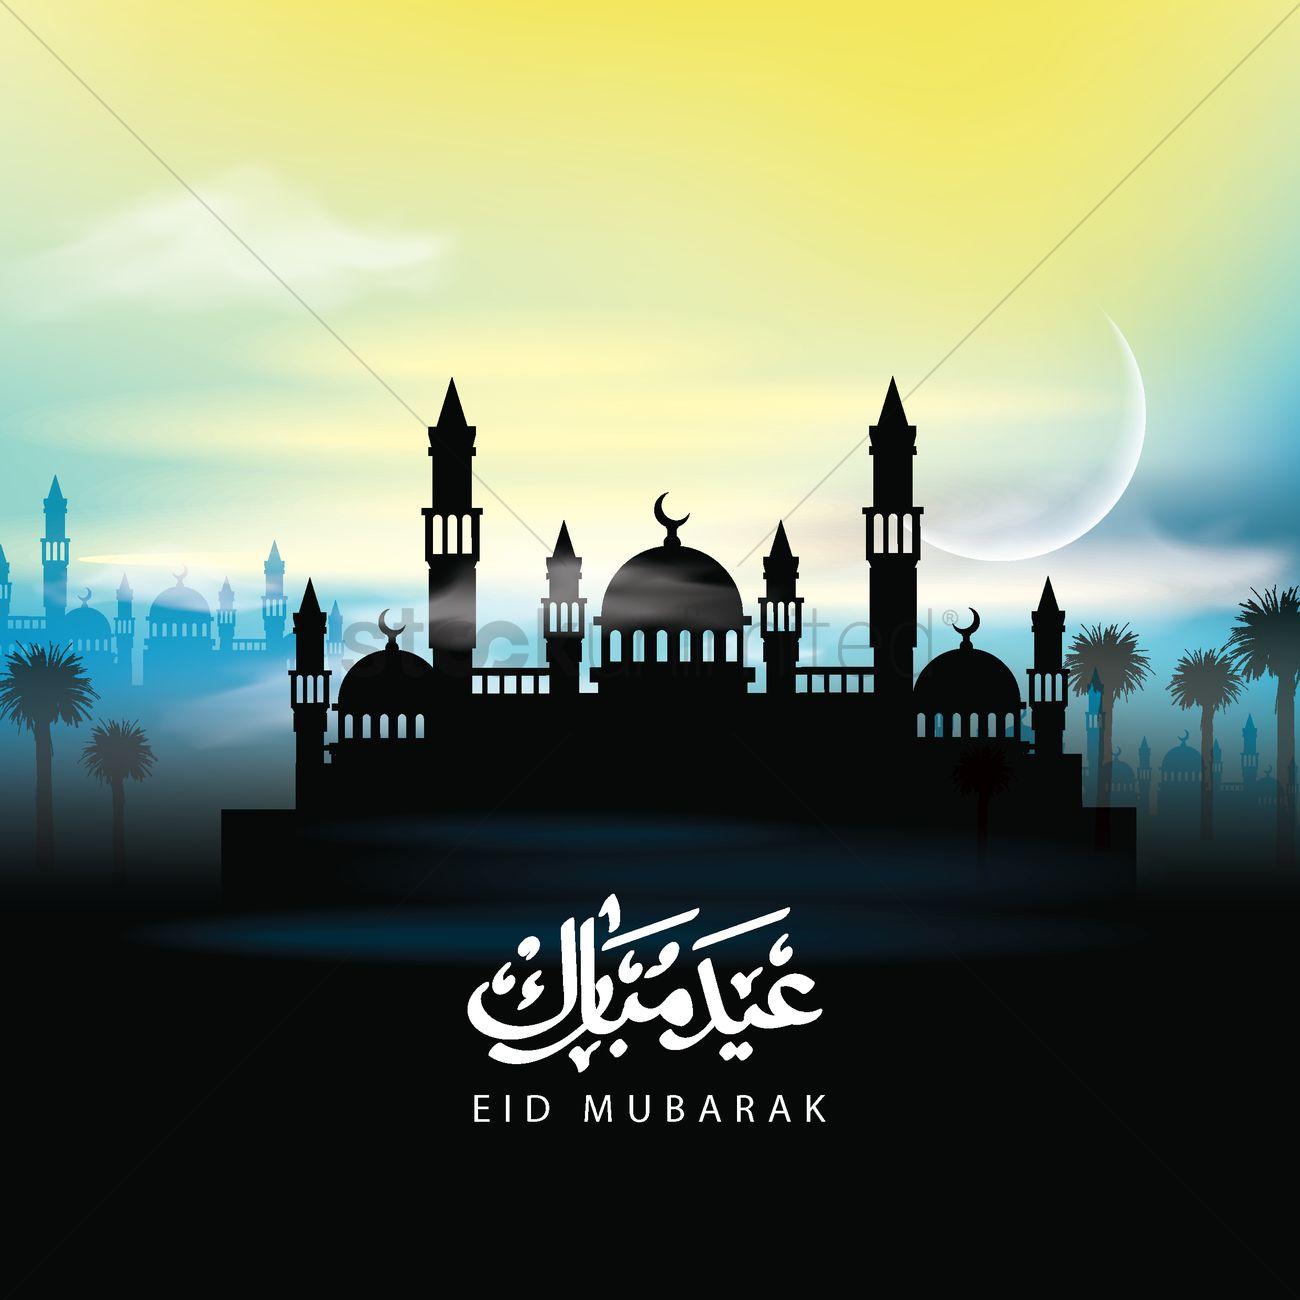 Eid mubarak greeting vector image 1828275 stockunlimited eid mubarak greeting vector graphic kristyandbryce Choice Image